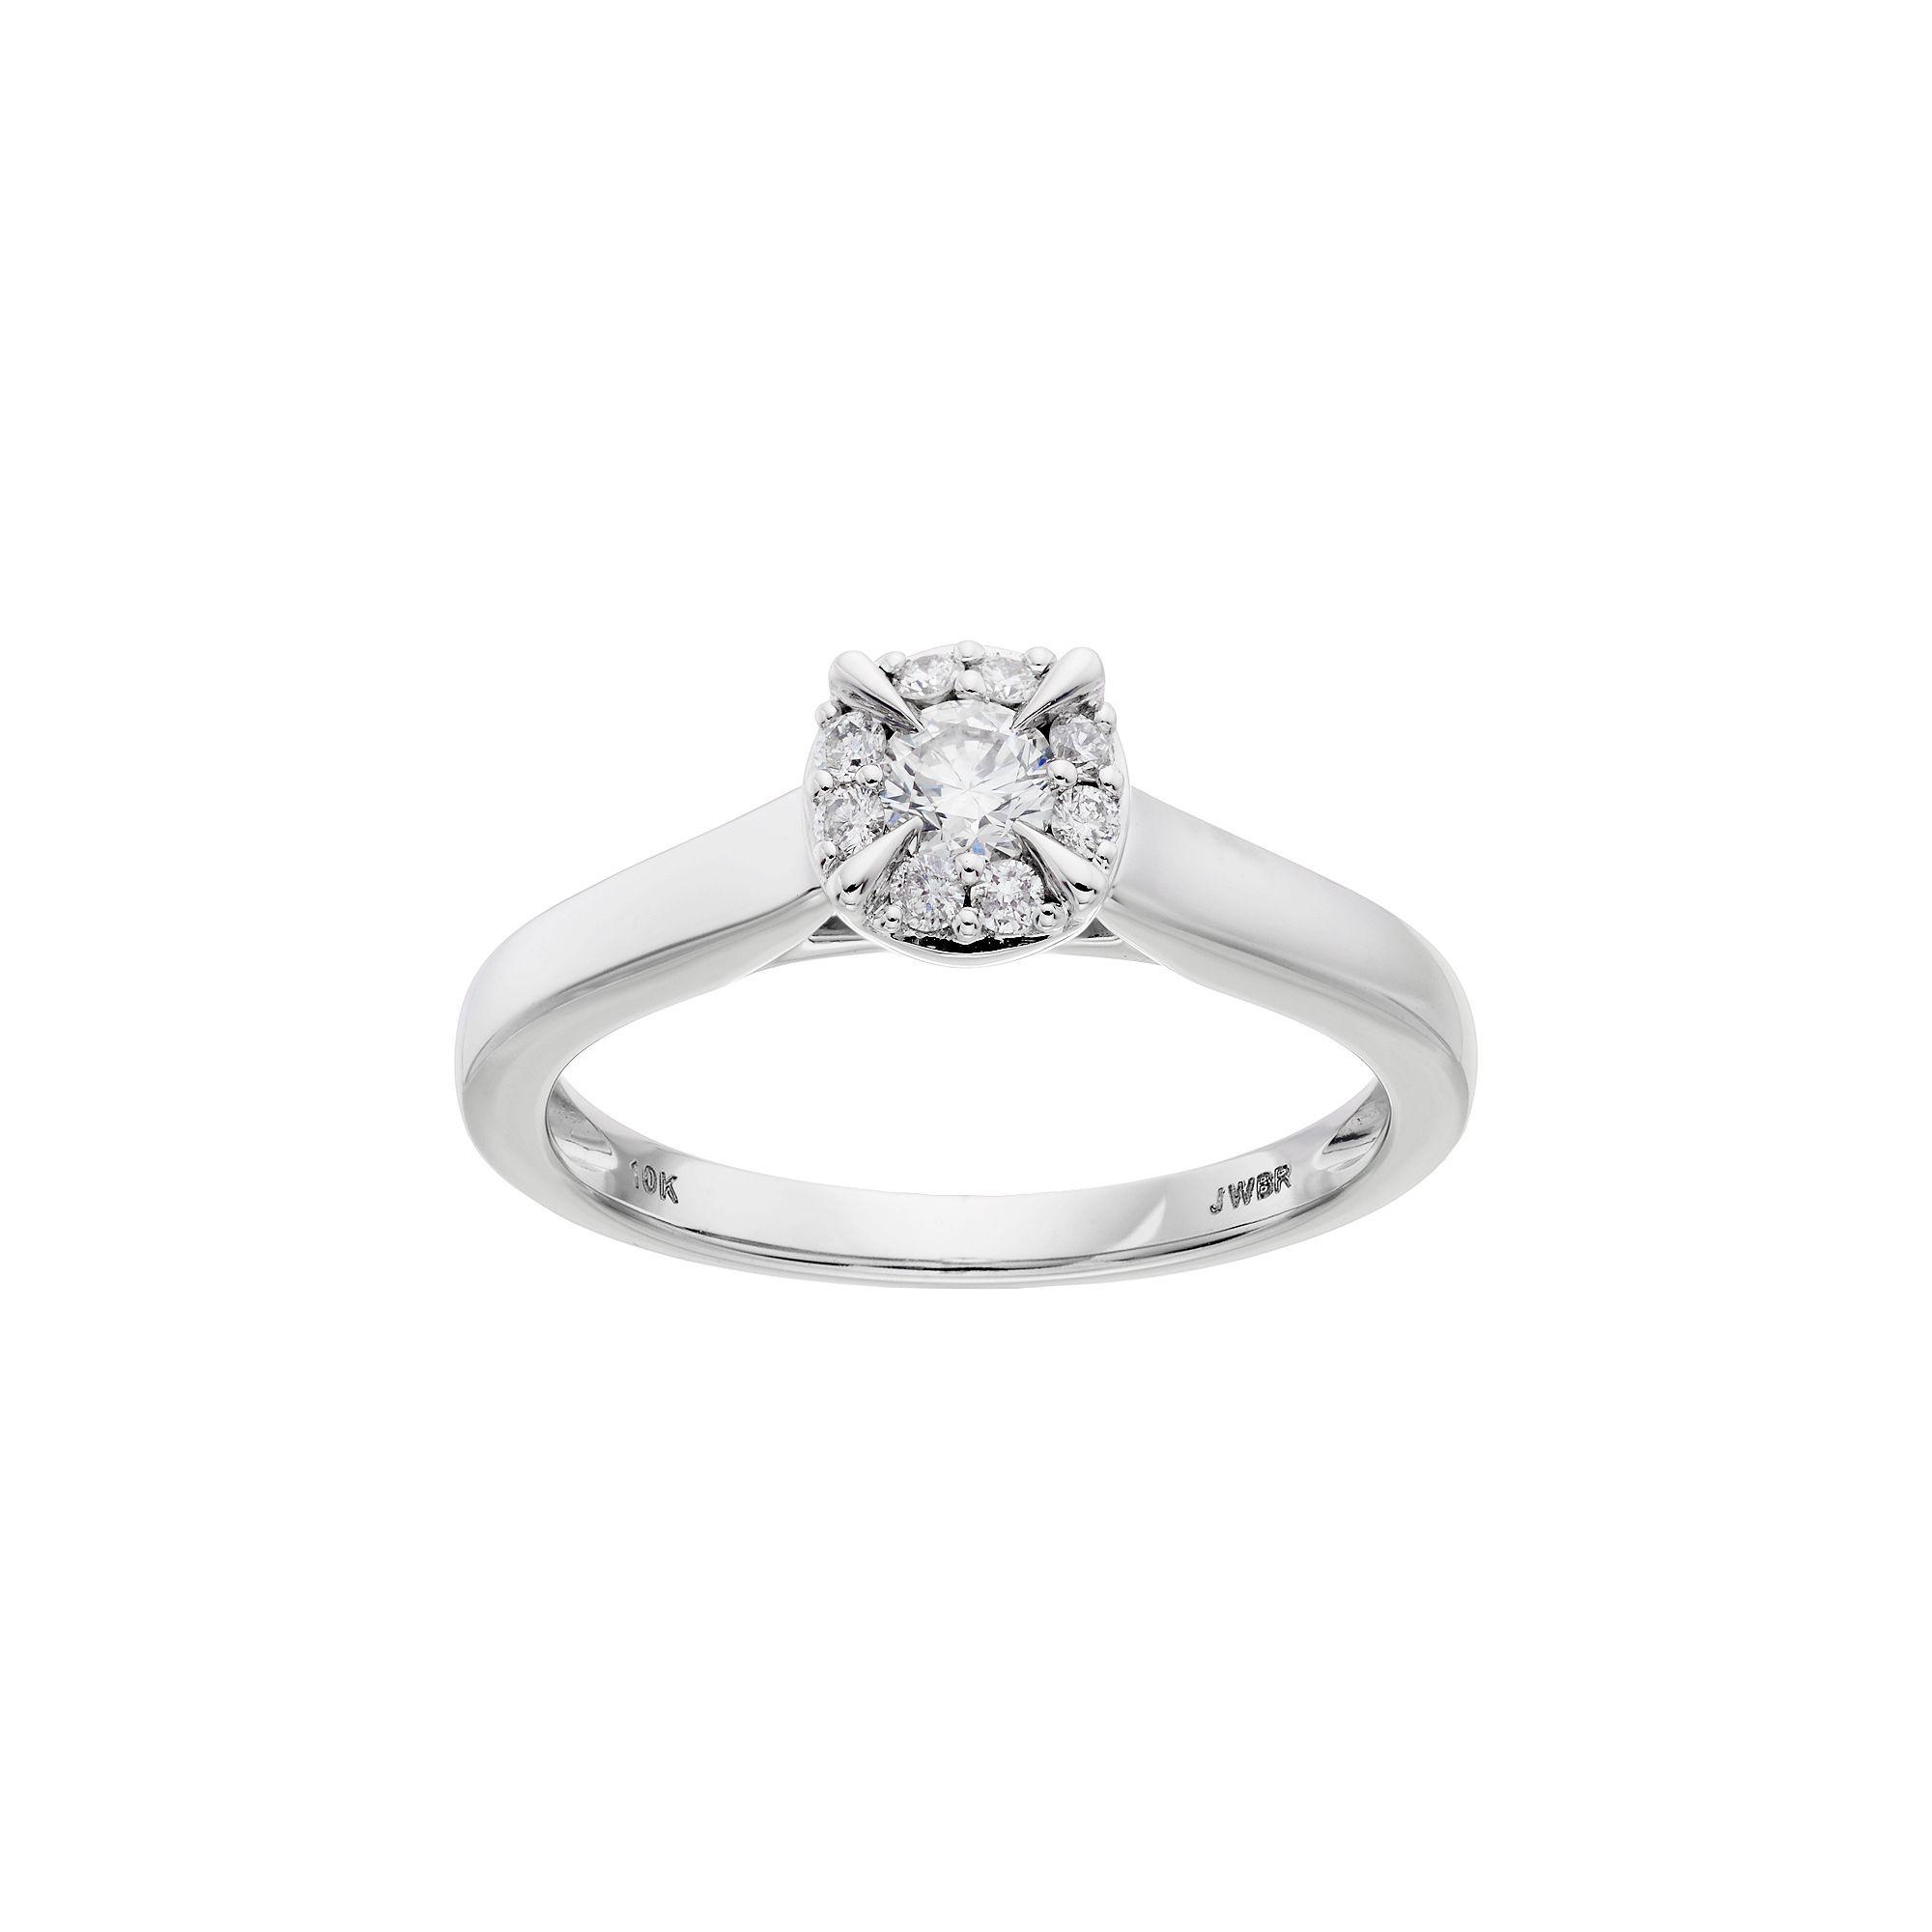 Lovemark 10k White Gold 1 3 Carat T W Diamond Halo Engagement Ring Halo Diamond Engagement Ring Halo Diamond Engagement Rings